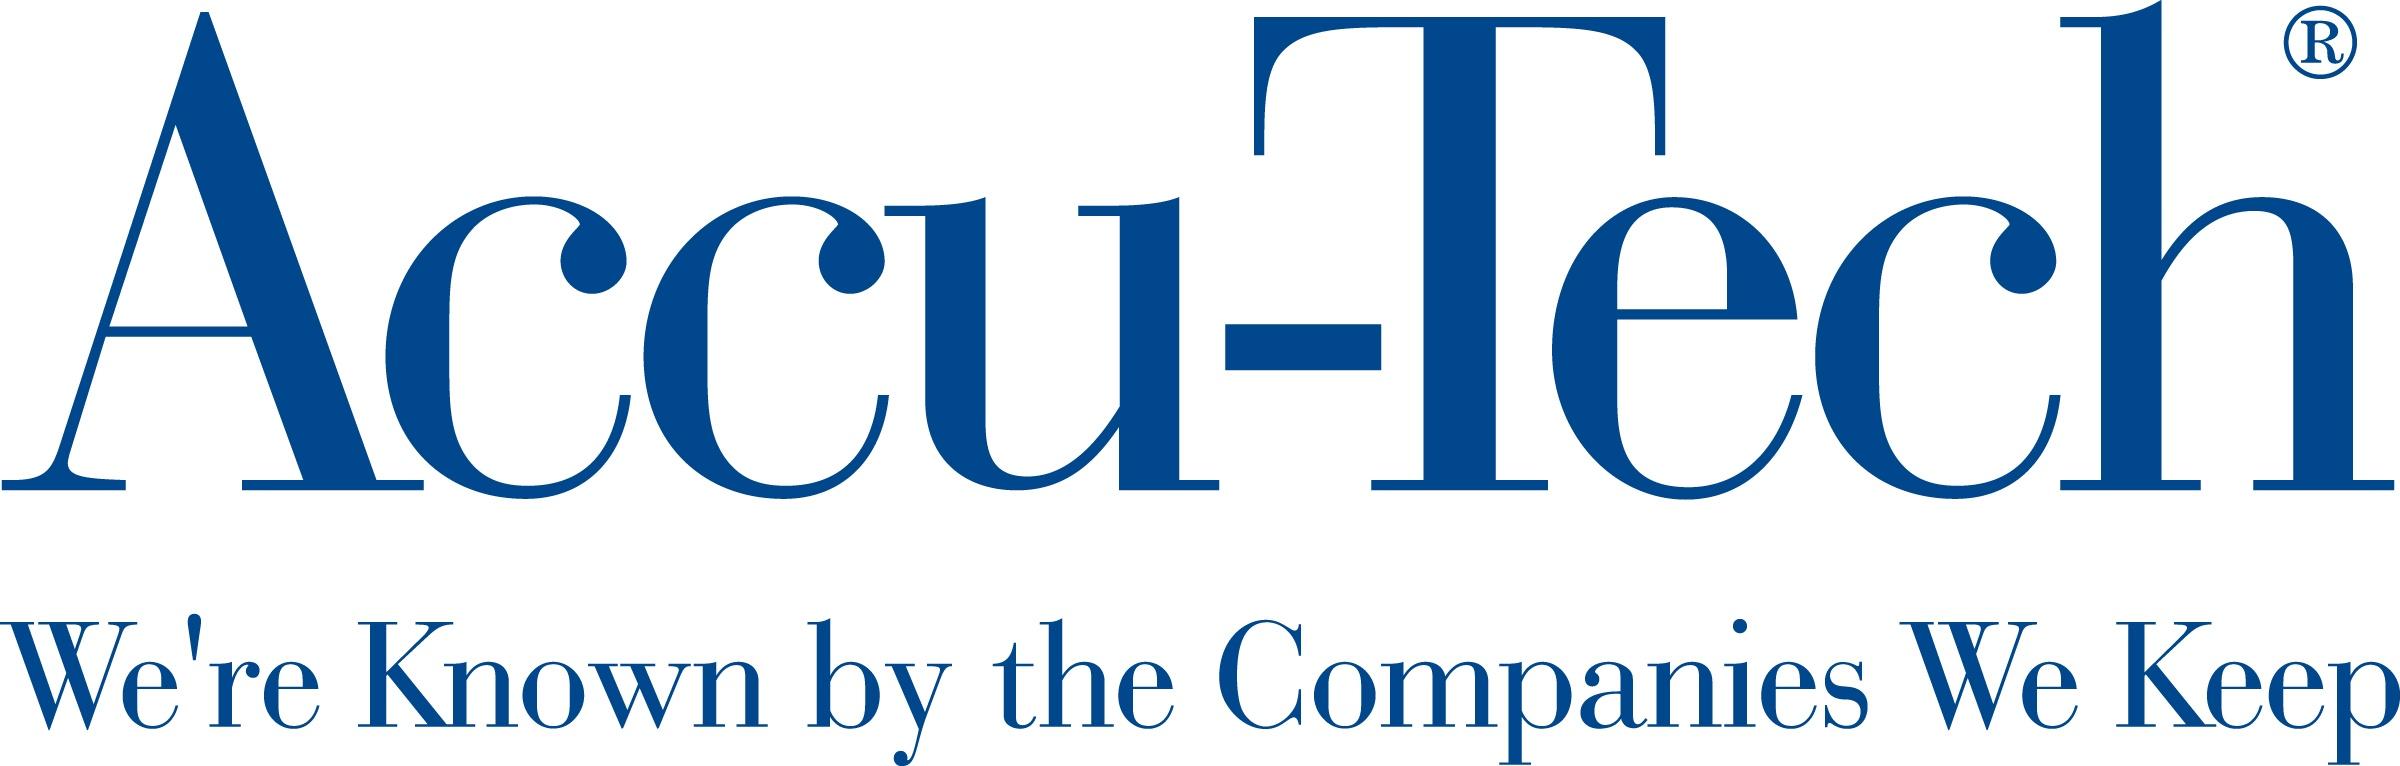 Accu-Tech Blue Tagline-3